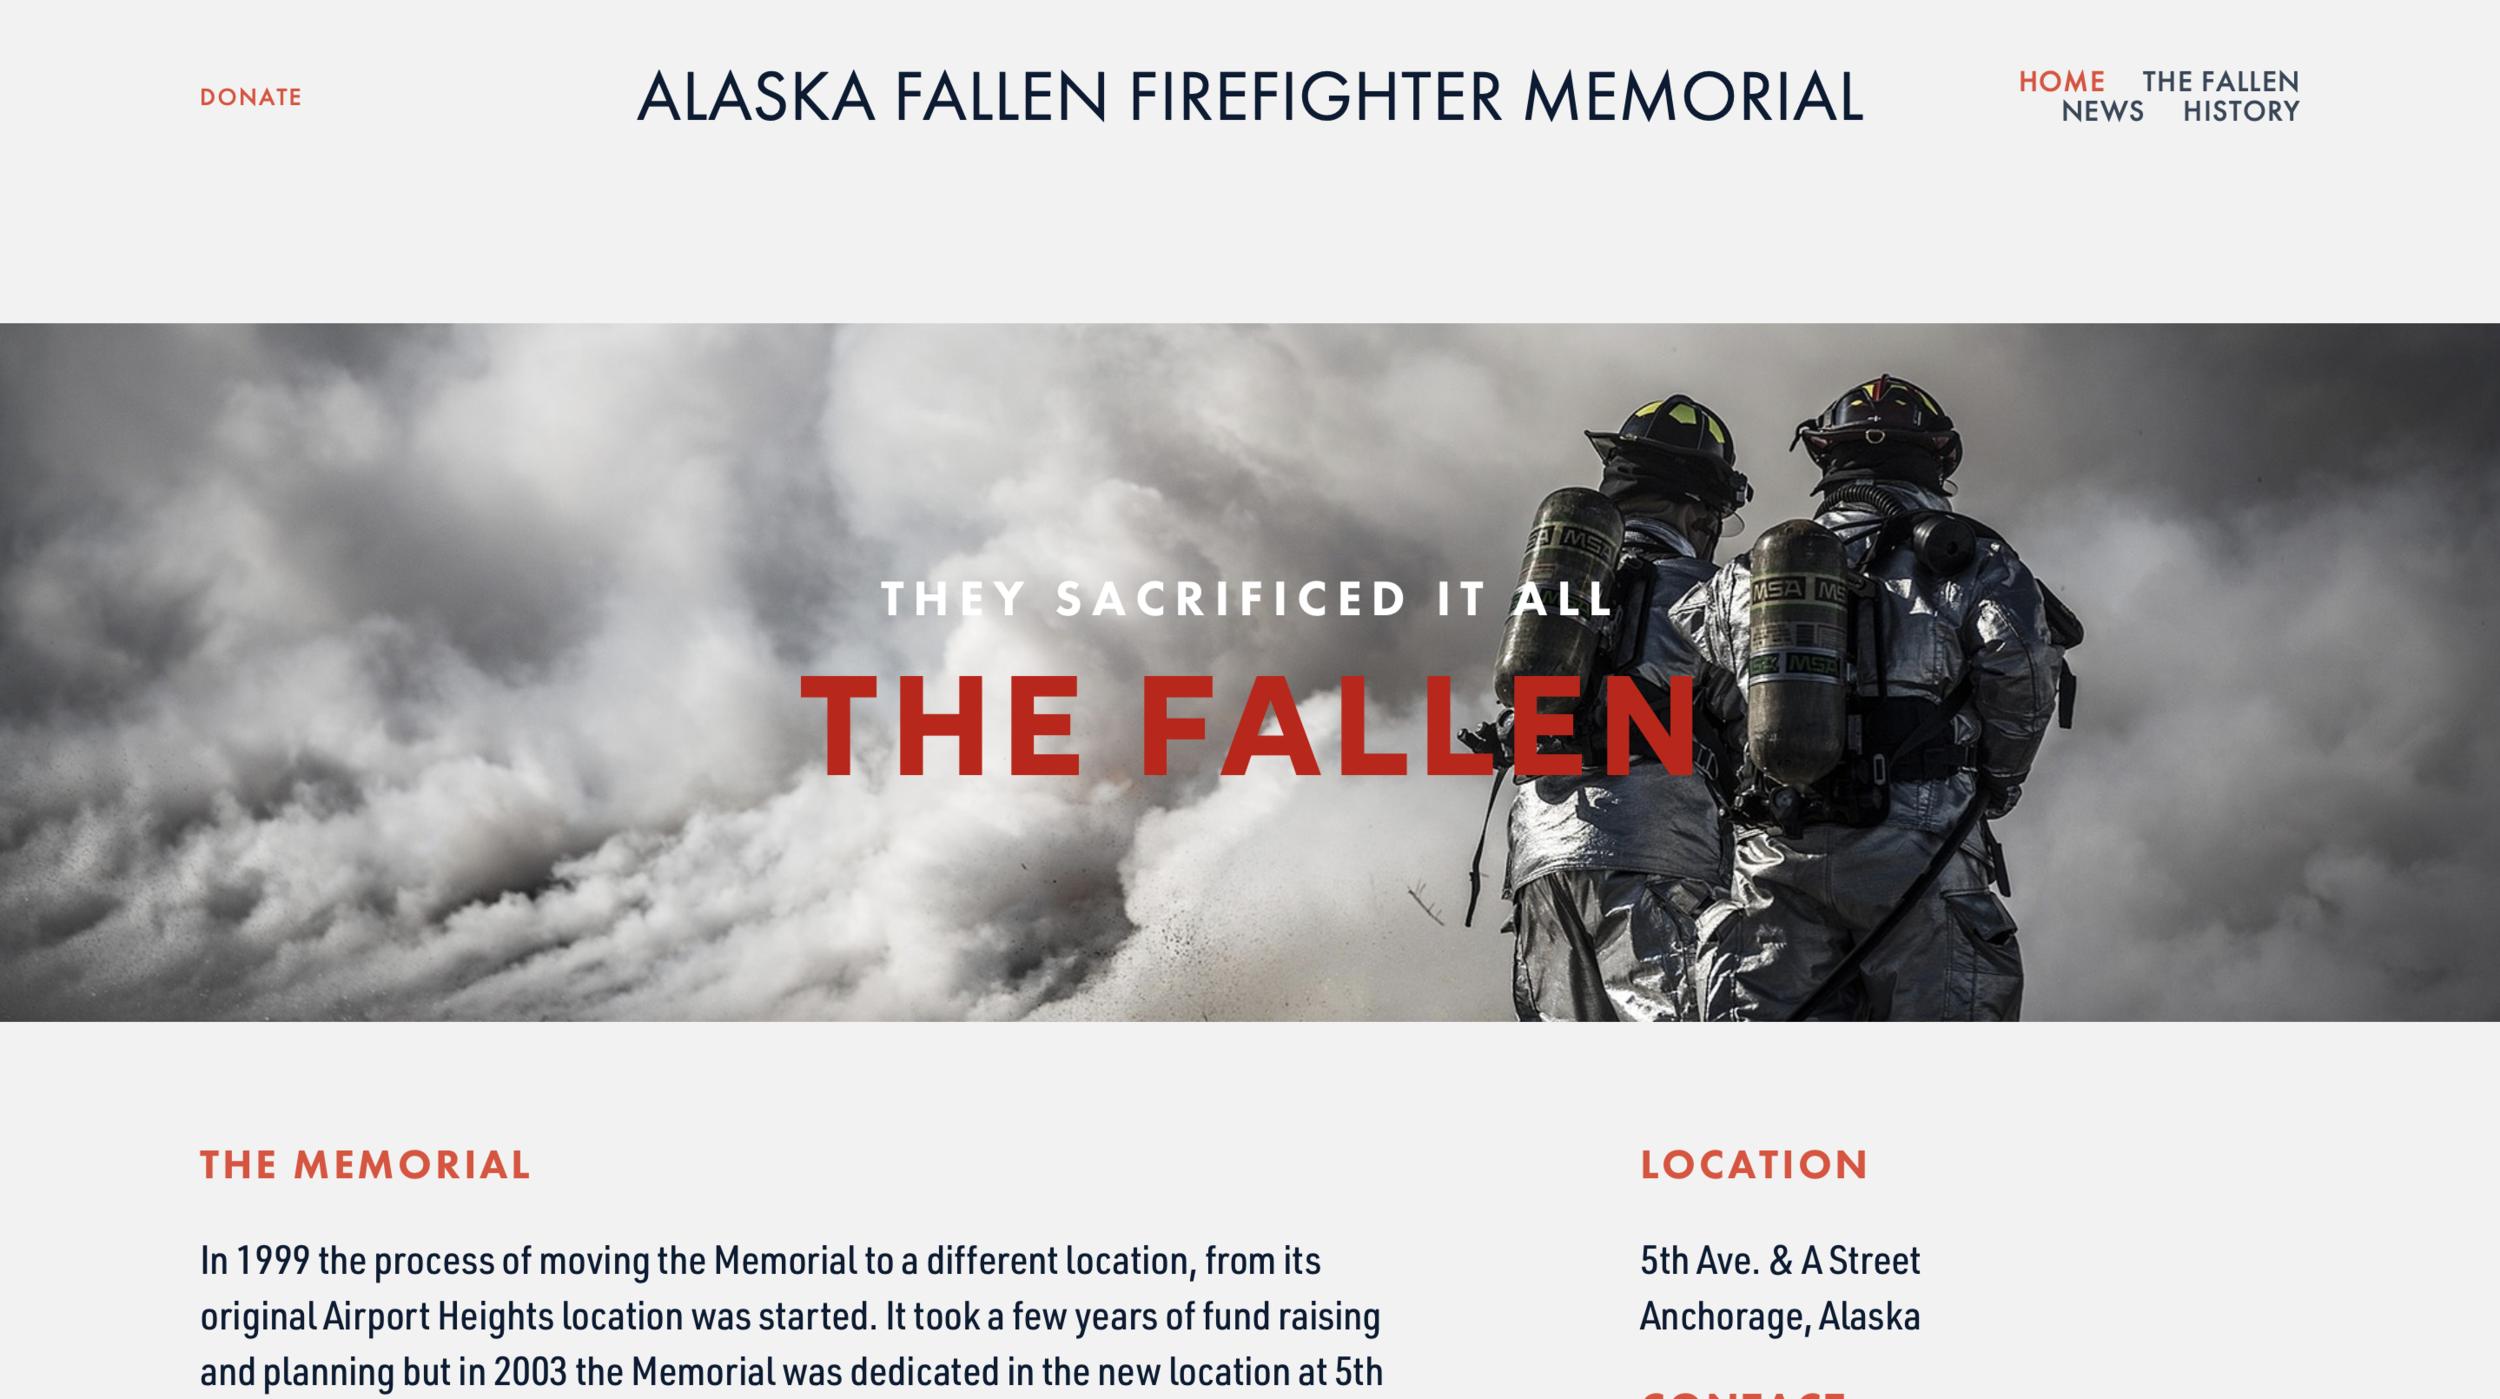 ALASKA FIREFIGHTER MEMORIAL, ANCHORAGE